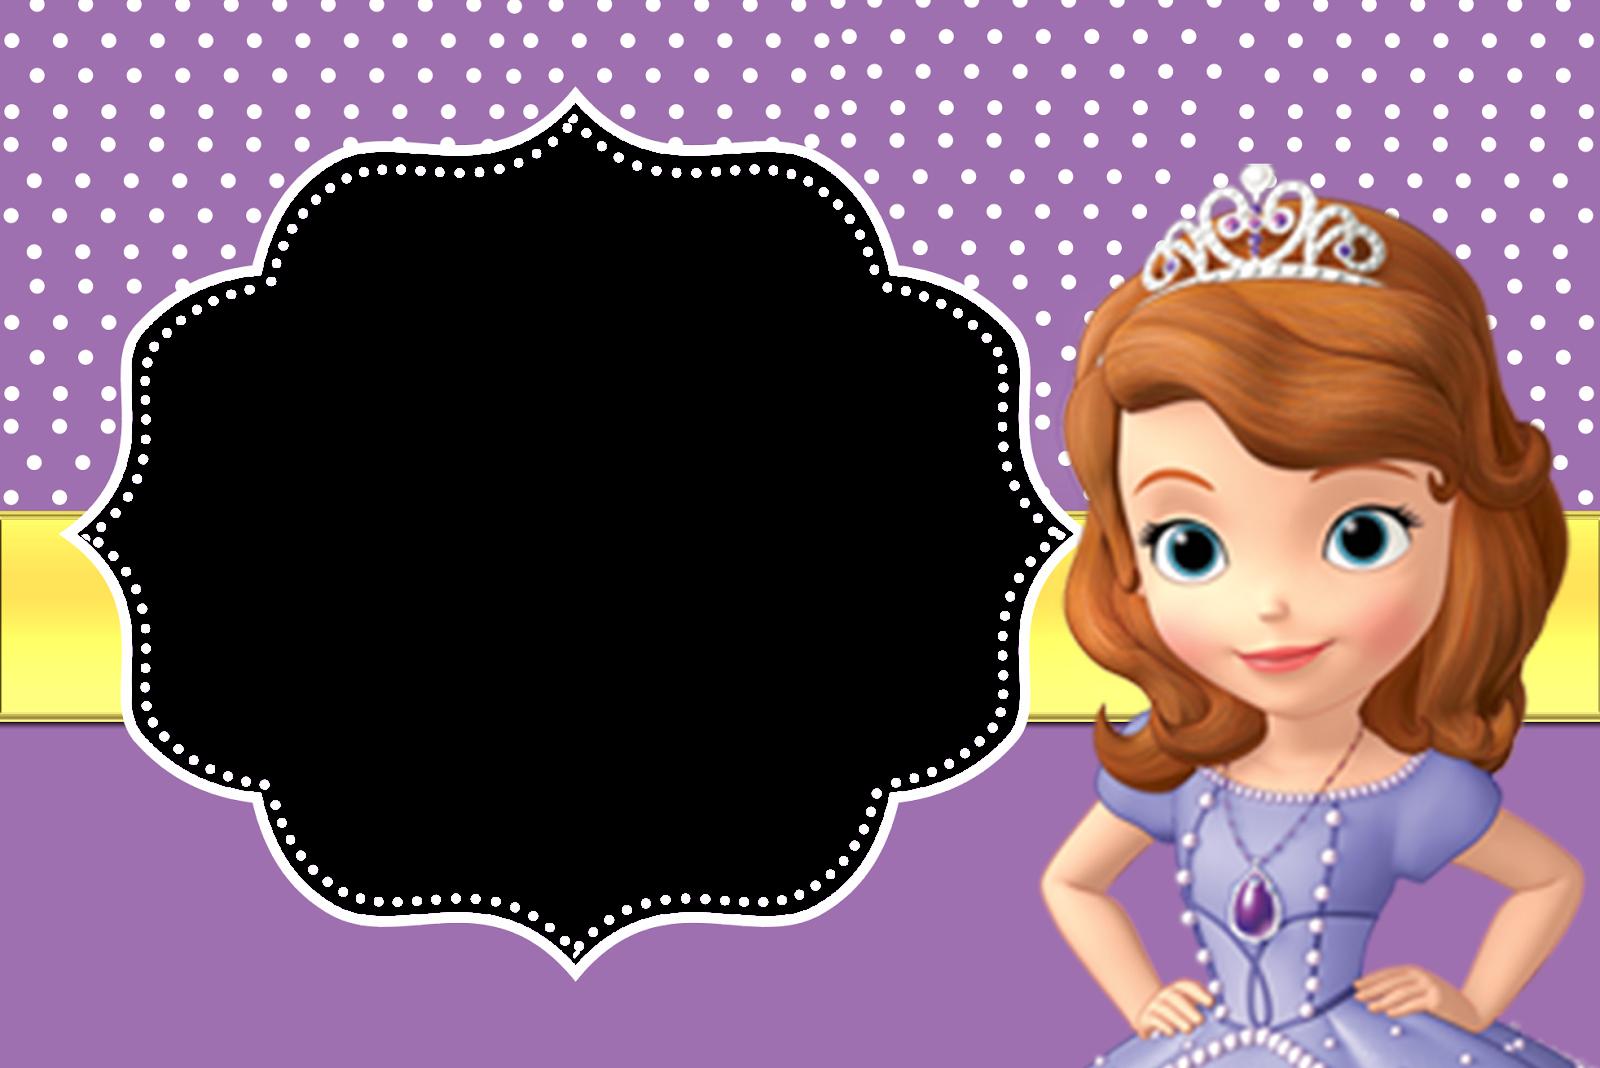 Colecci n de gifs marcos para fotos de la princesa sof a - Foto princesa sofia ...